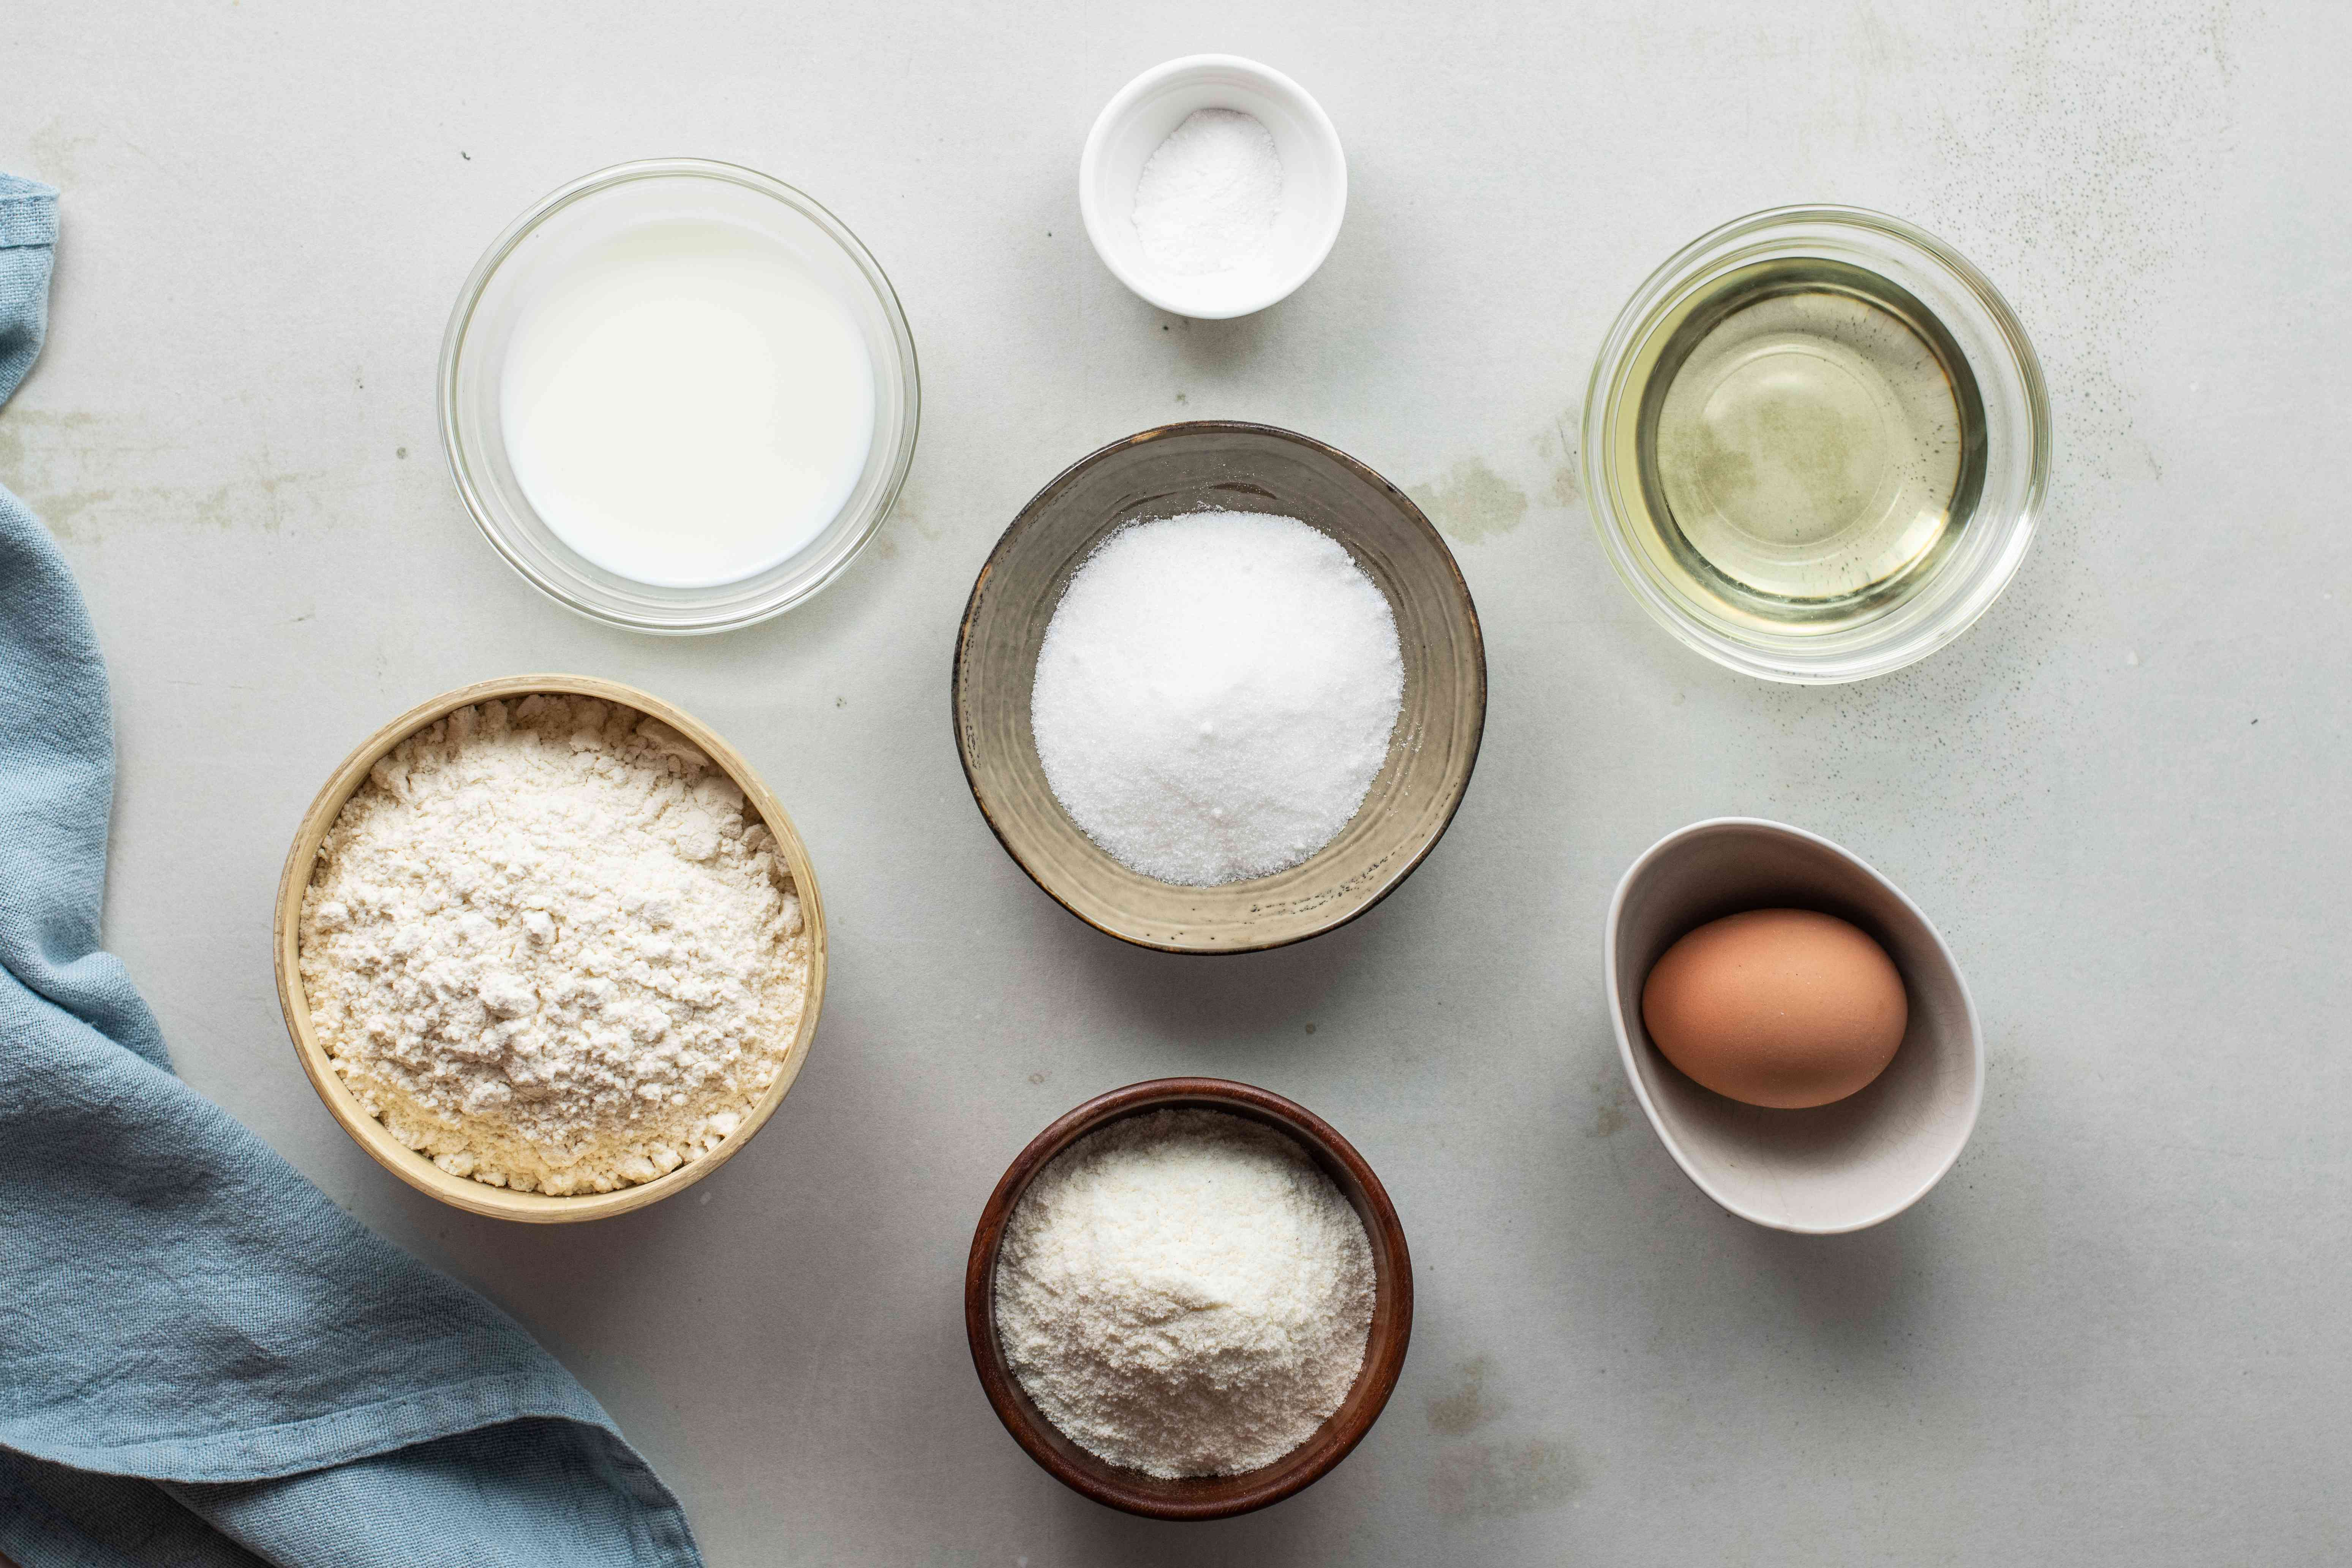 Ingredients for bunuelos